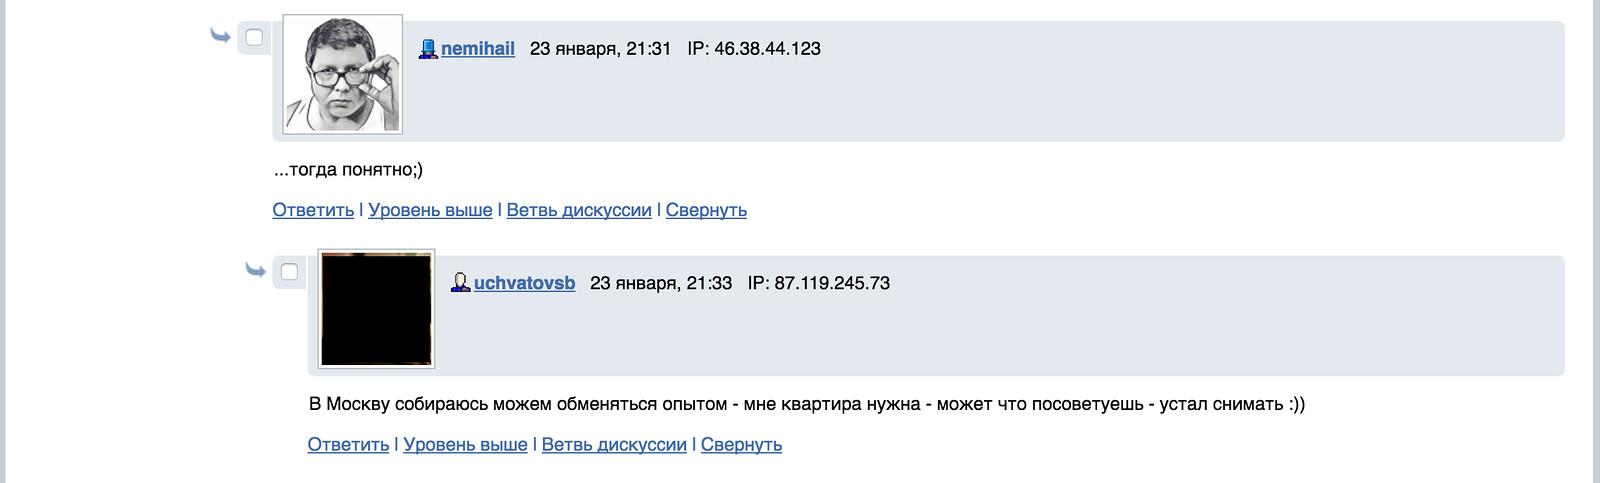 учватов3.jpg